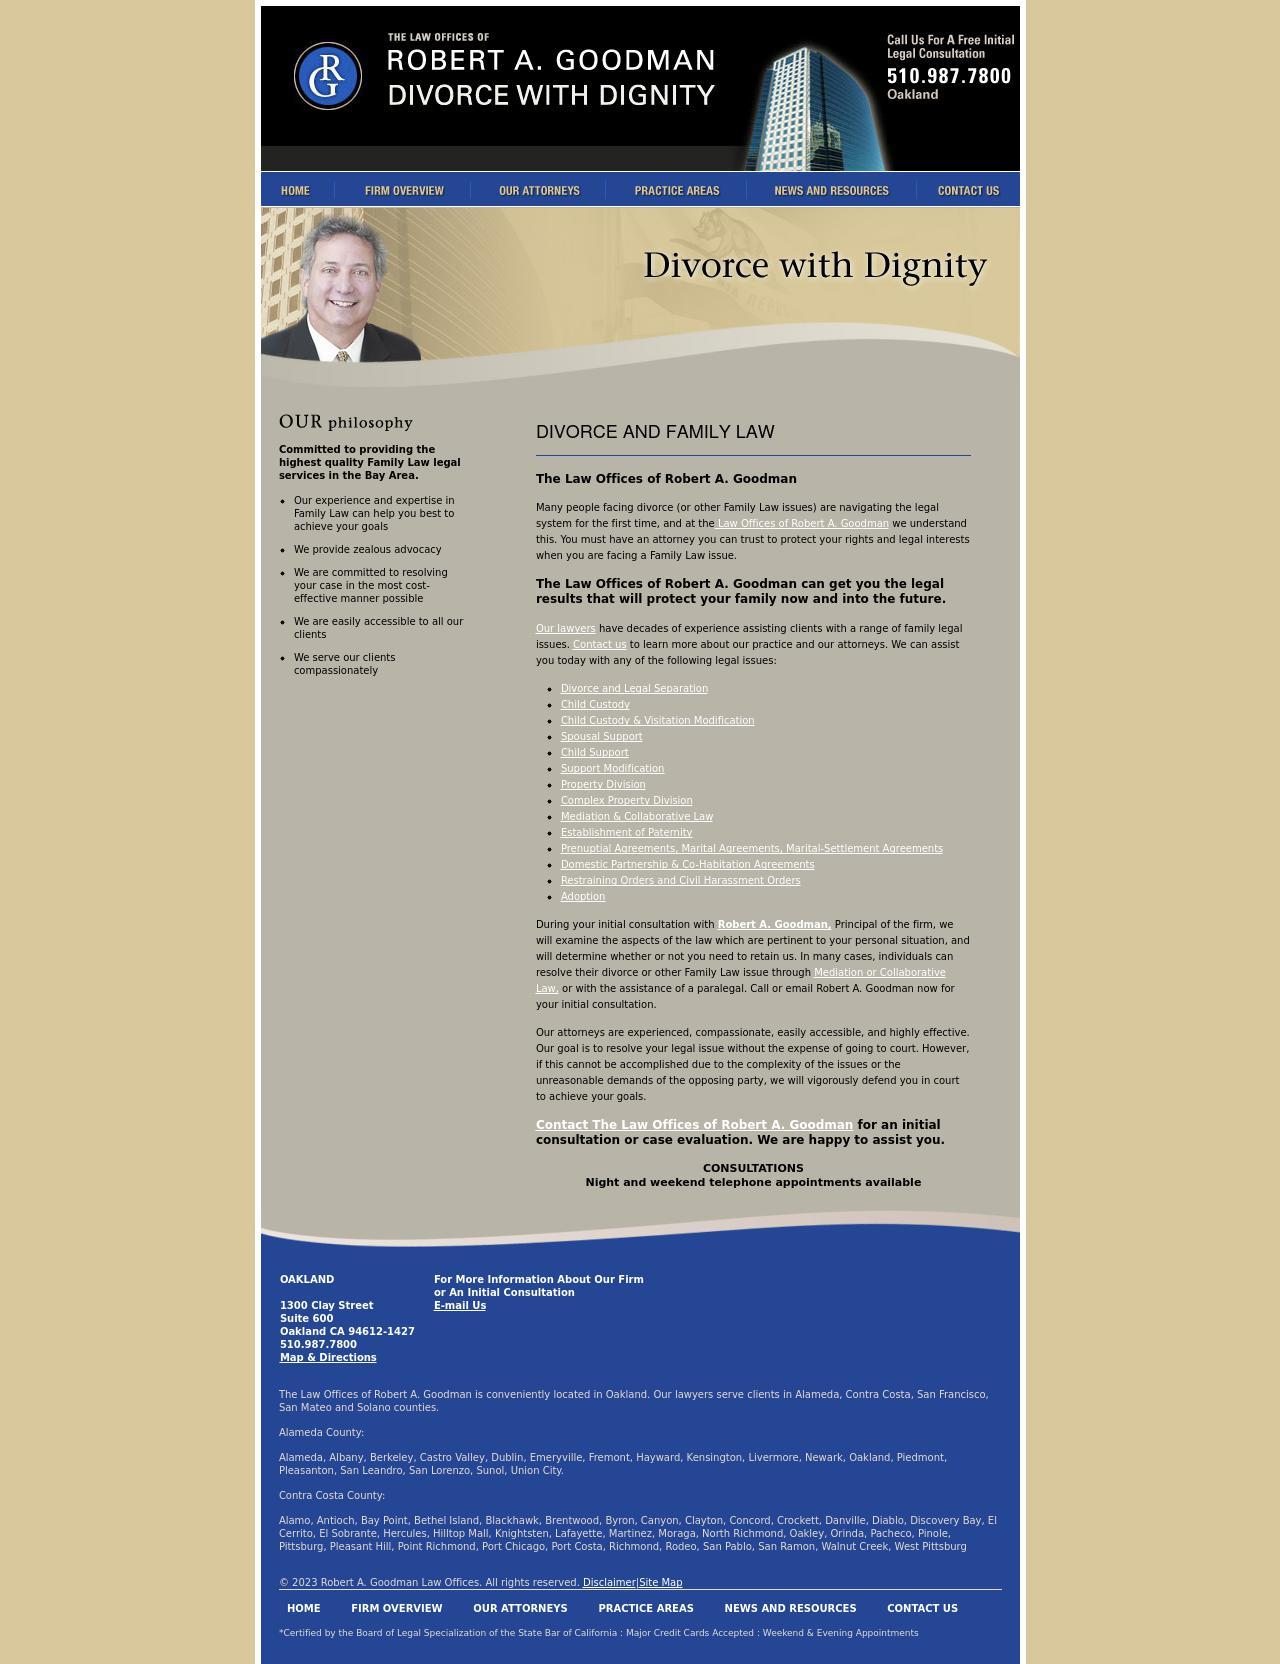 Robert A. Goodman Law Offices   Oakland CA Lawyers